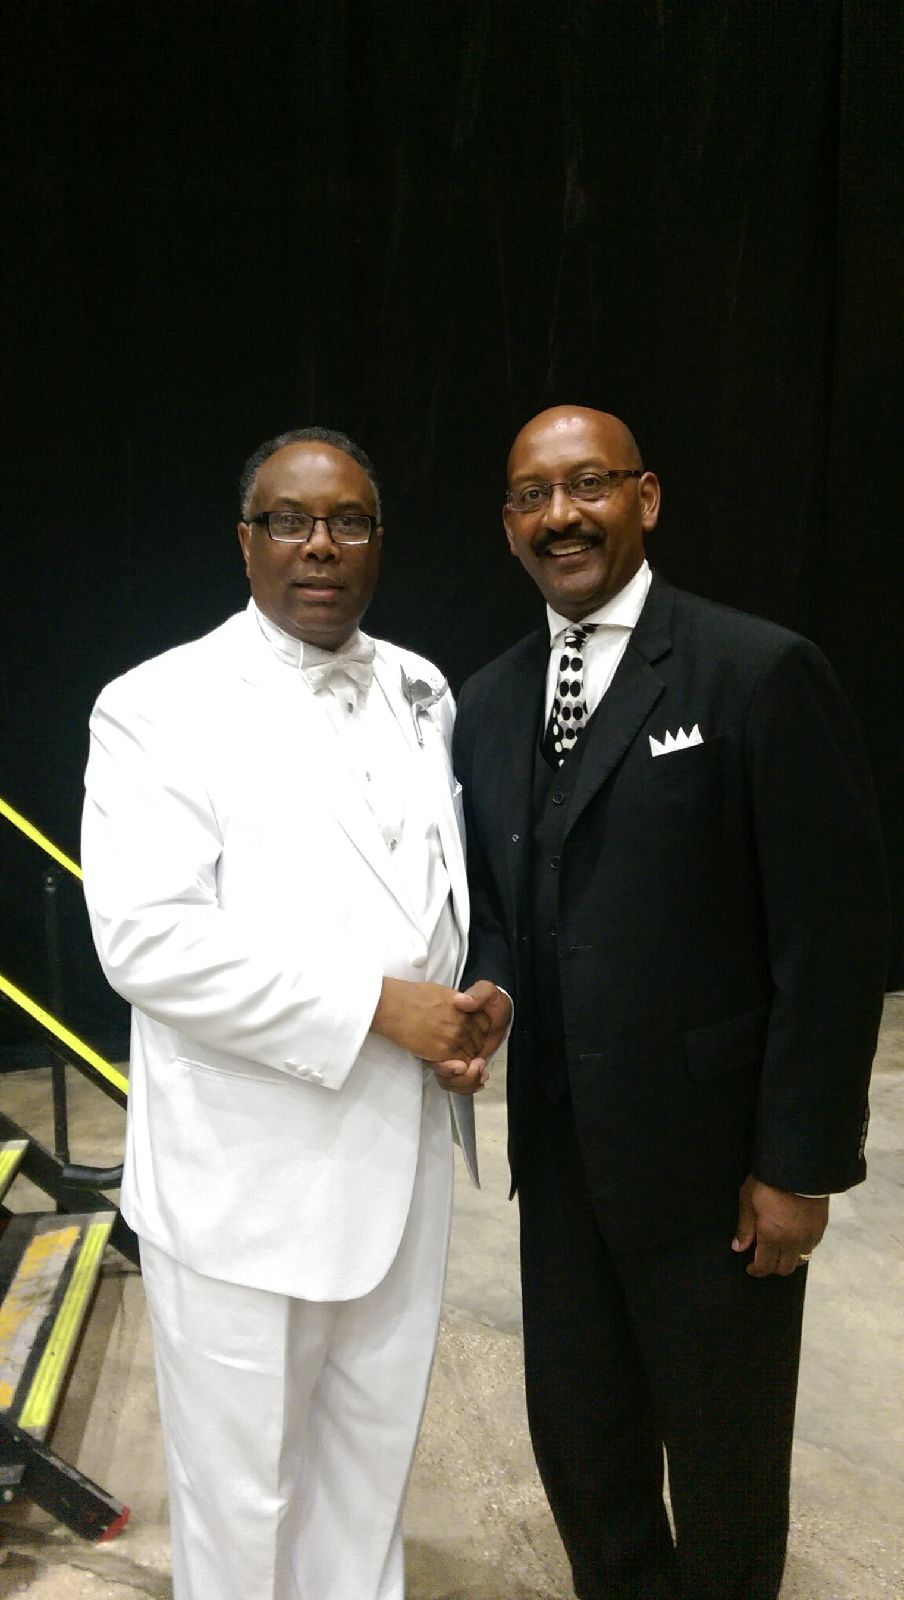 Pastor Alexander with the President of the National Baptist Convention of America International, Inc., Dr. Samuel C. Tolbert Jr.